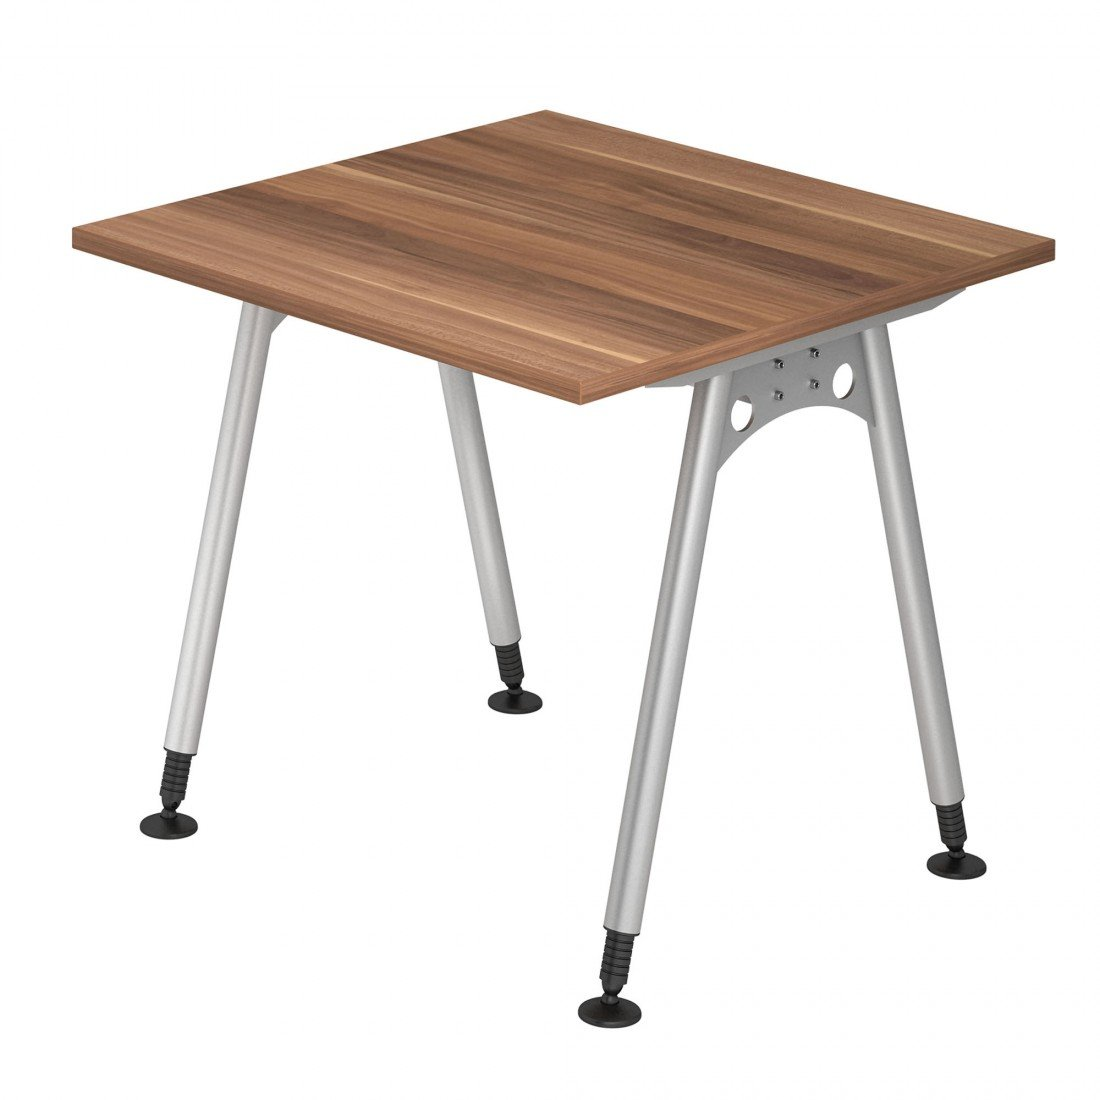 Dr de oficina escritorio 80 x 80 cm - Altura ajustable de 68 - 76 ...